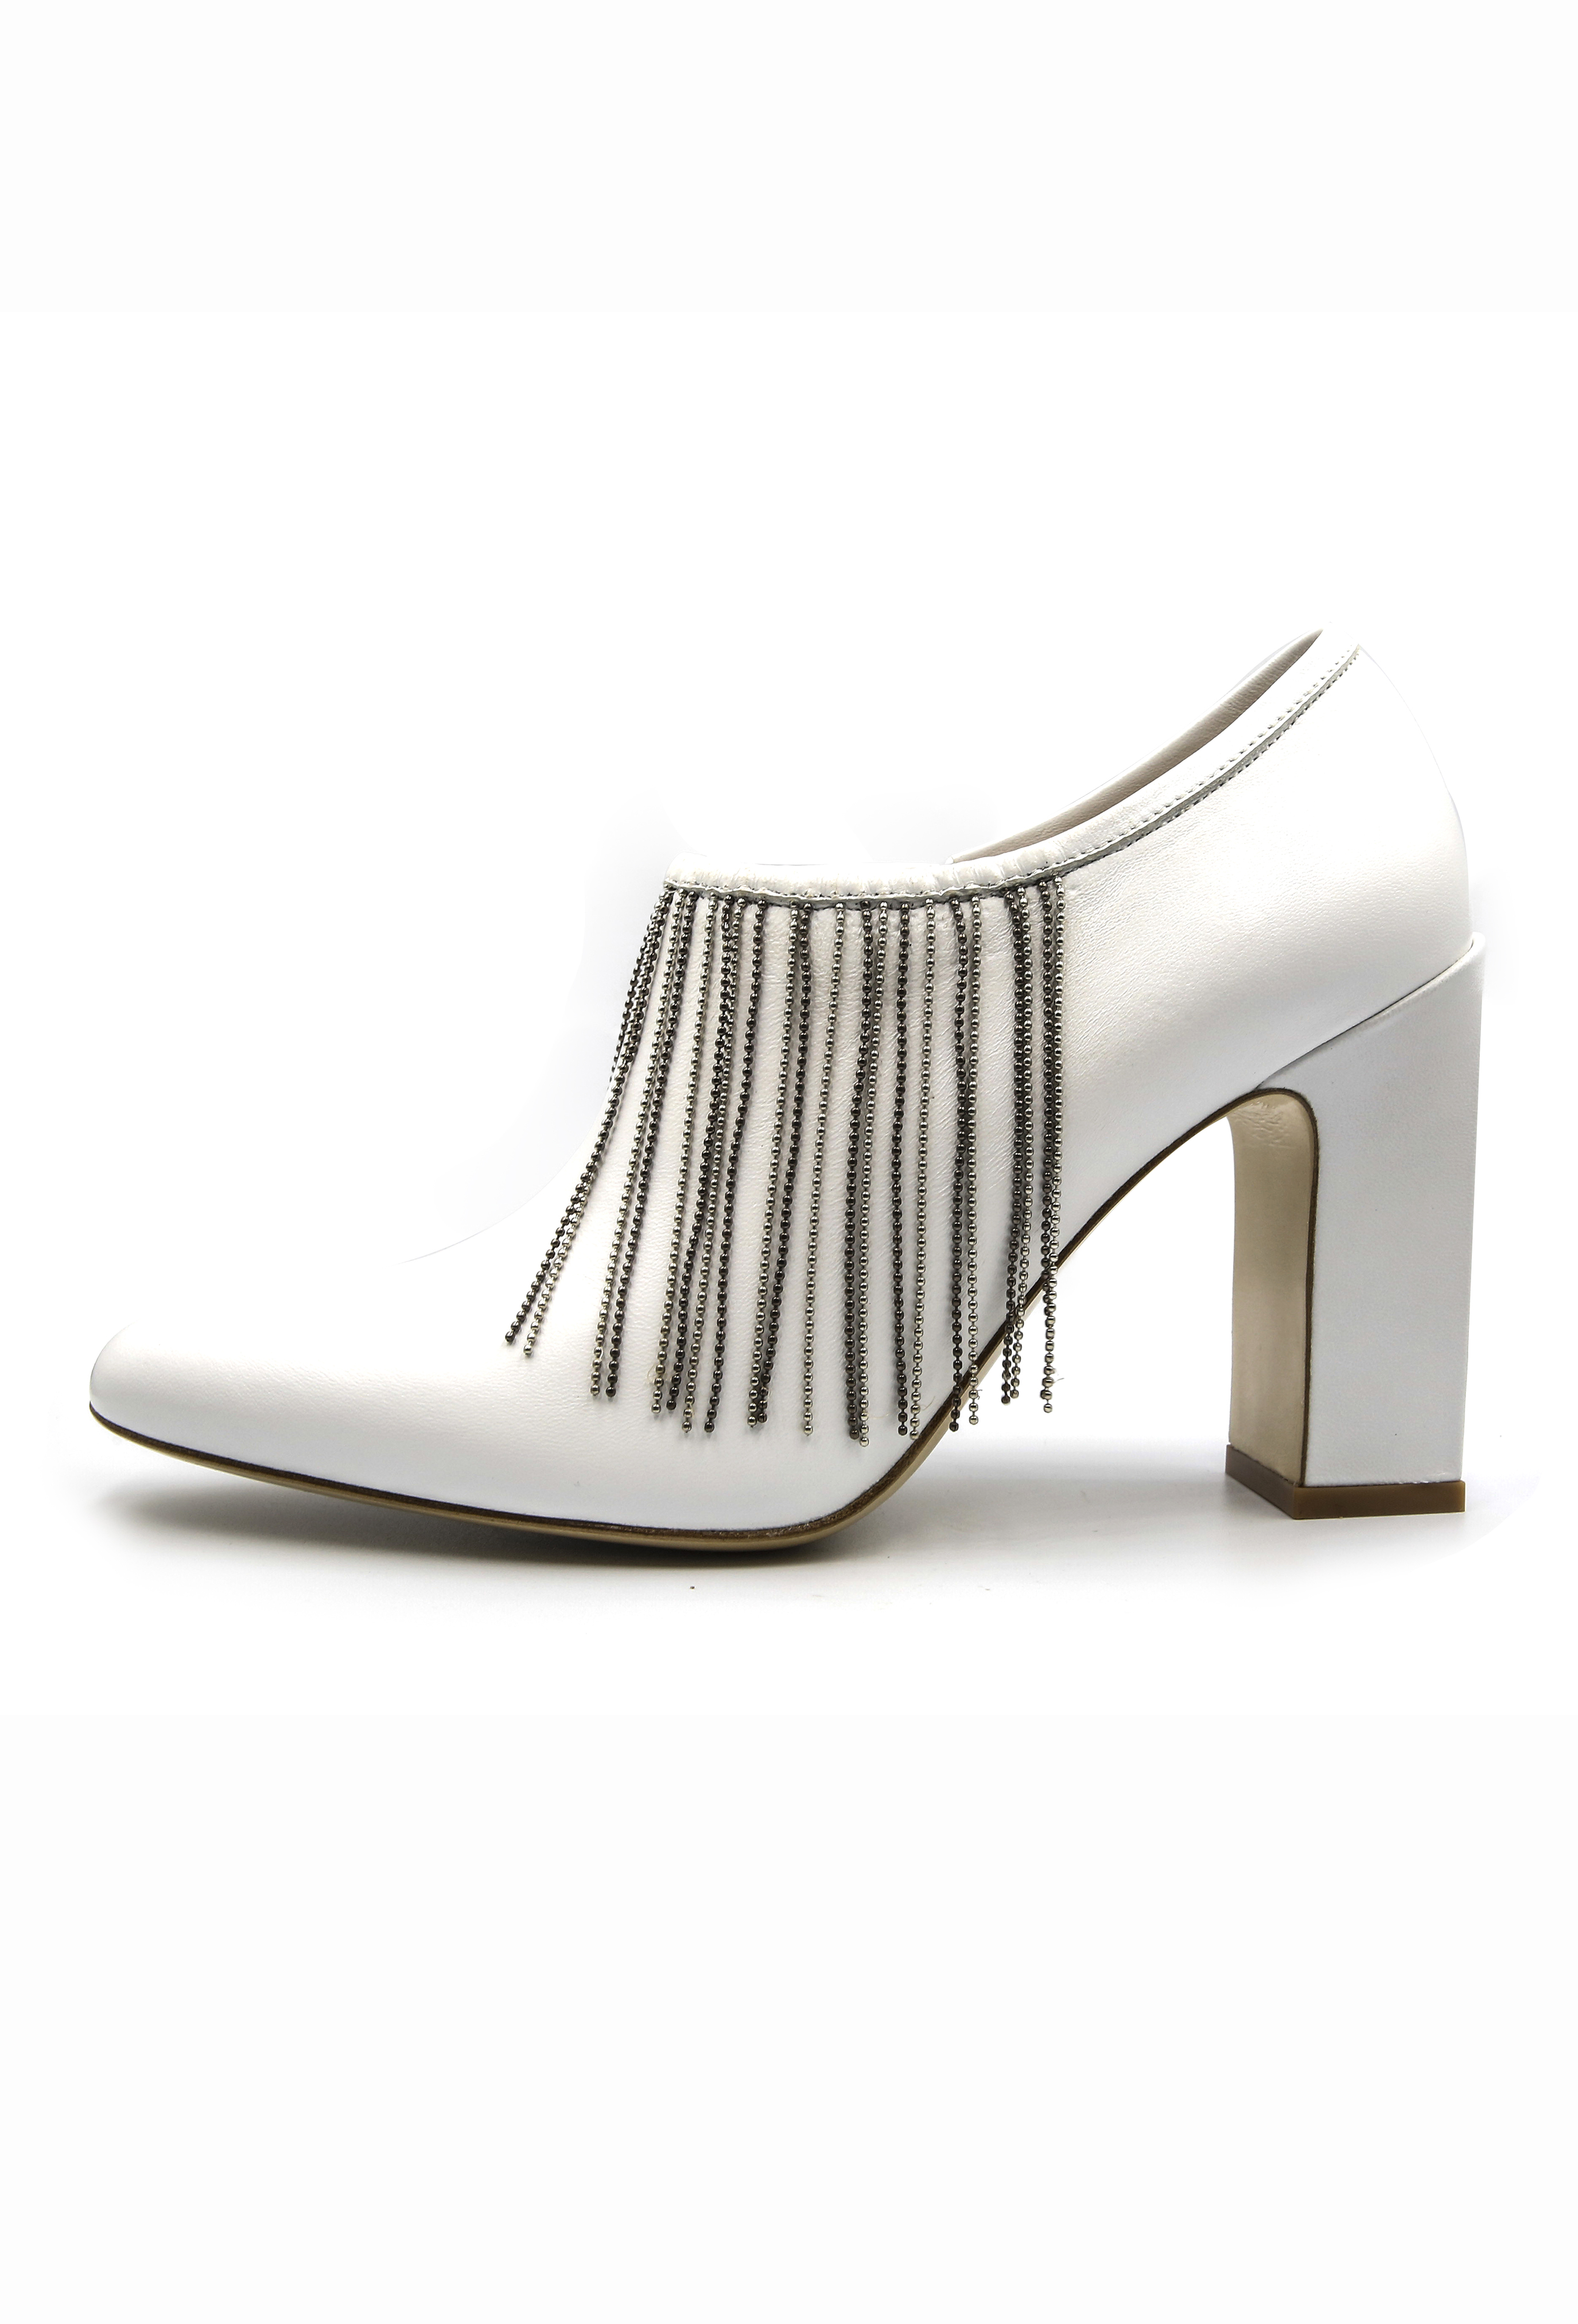 White Nicolette Heels